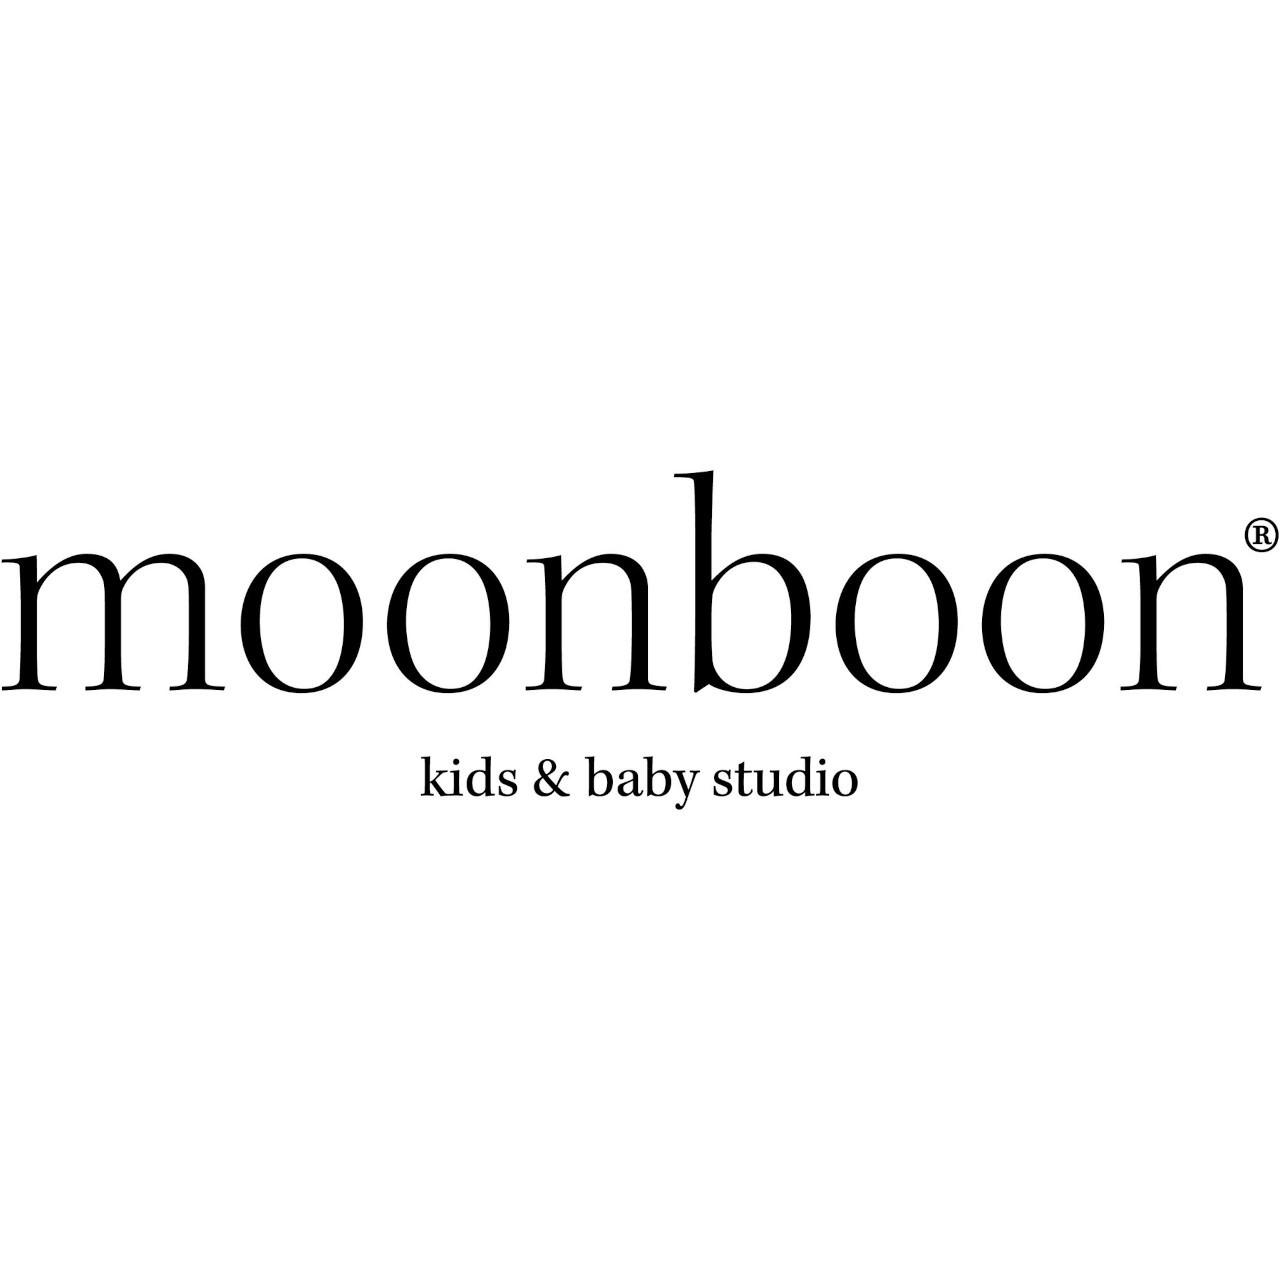 MOONBOON logo